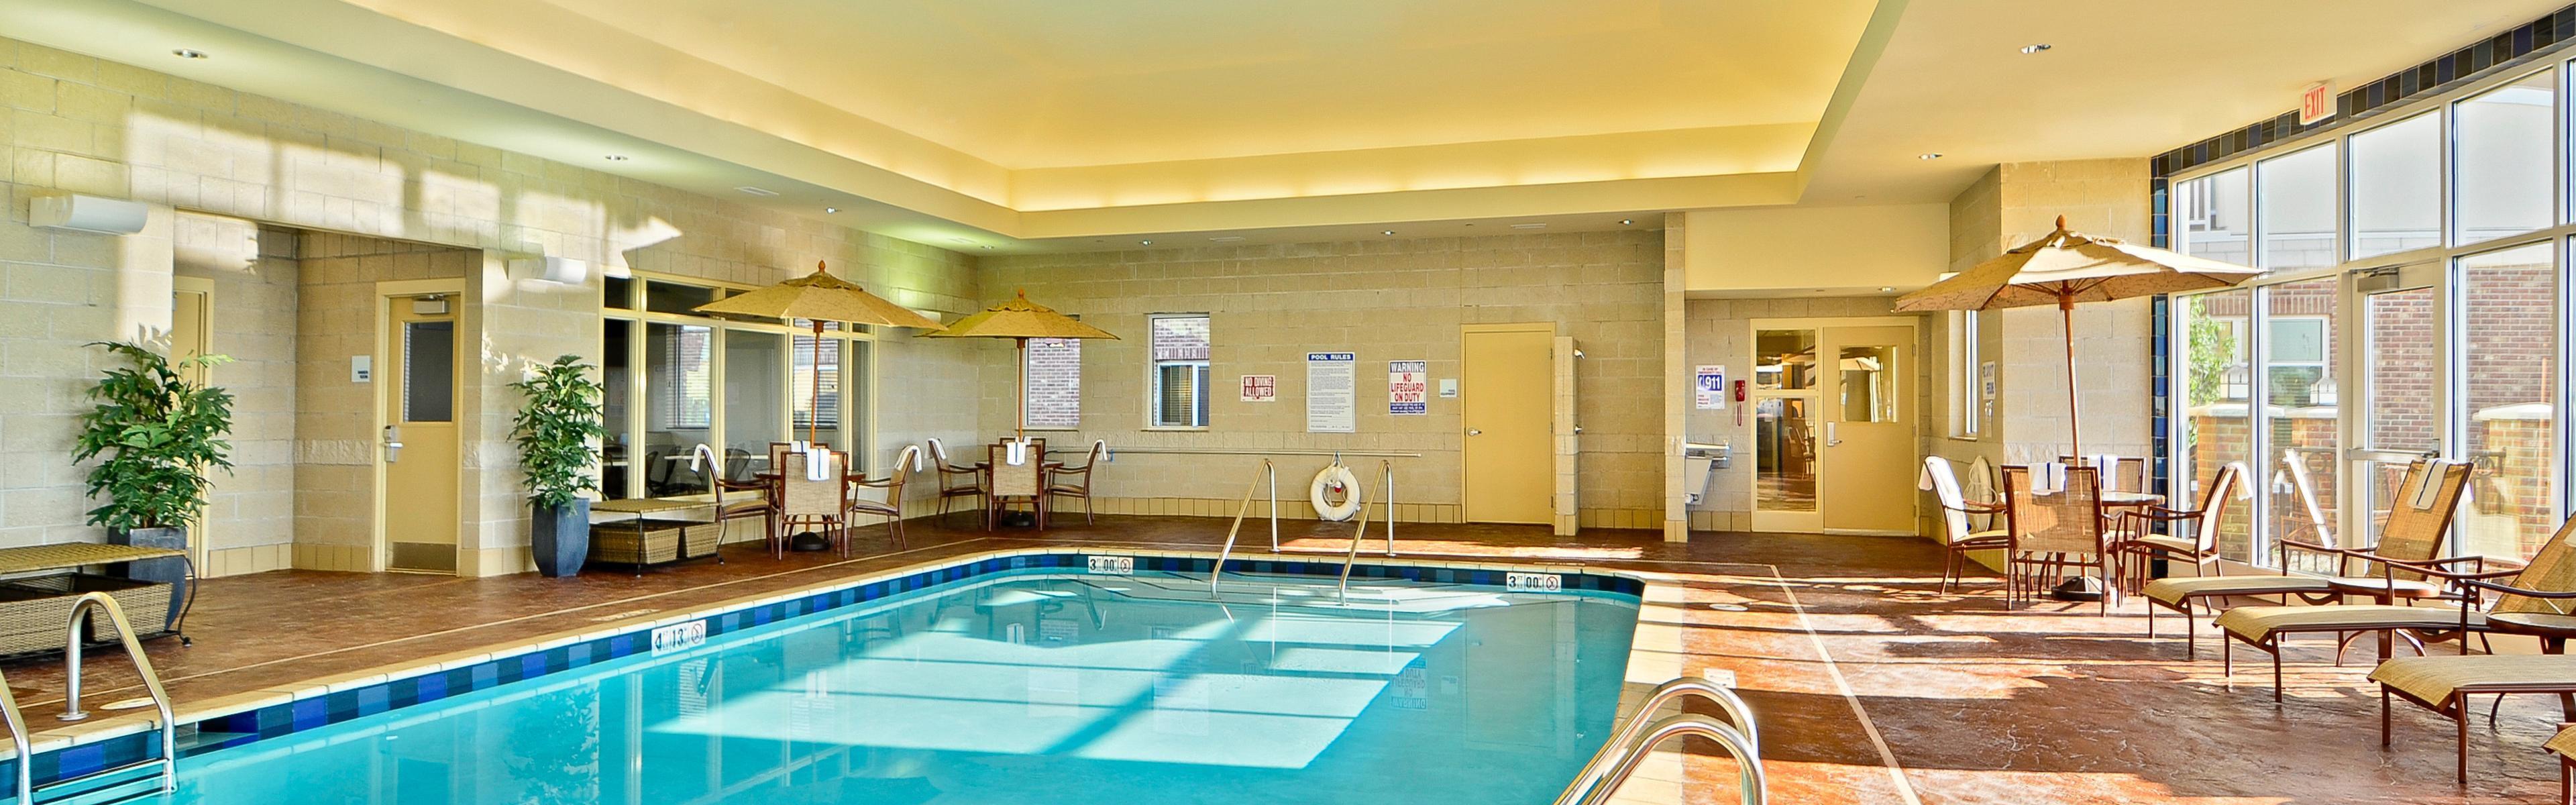 Holiday Inn Express & Suites Williston image 2